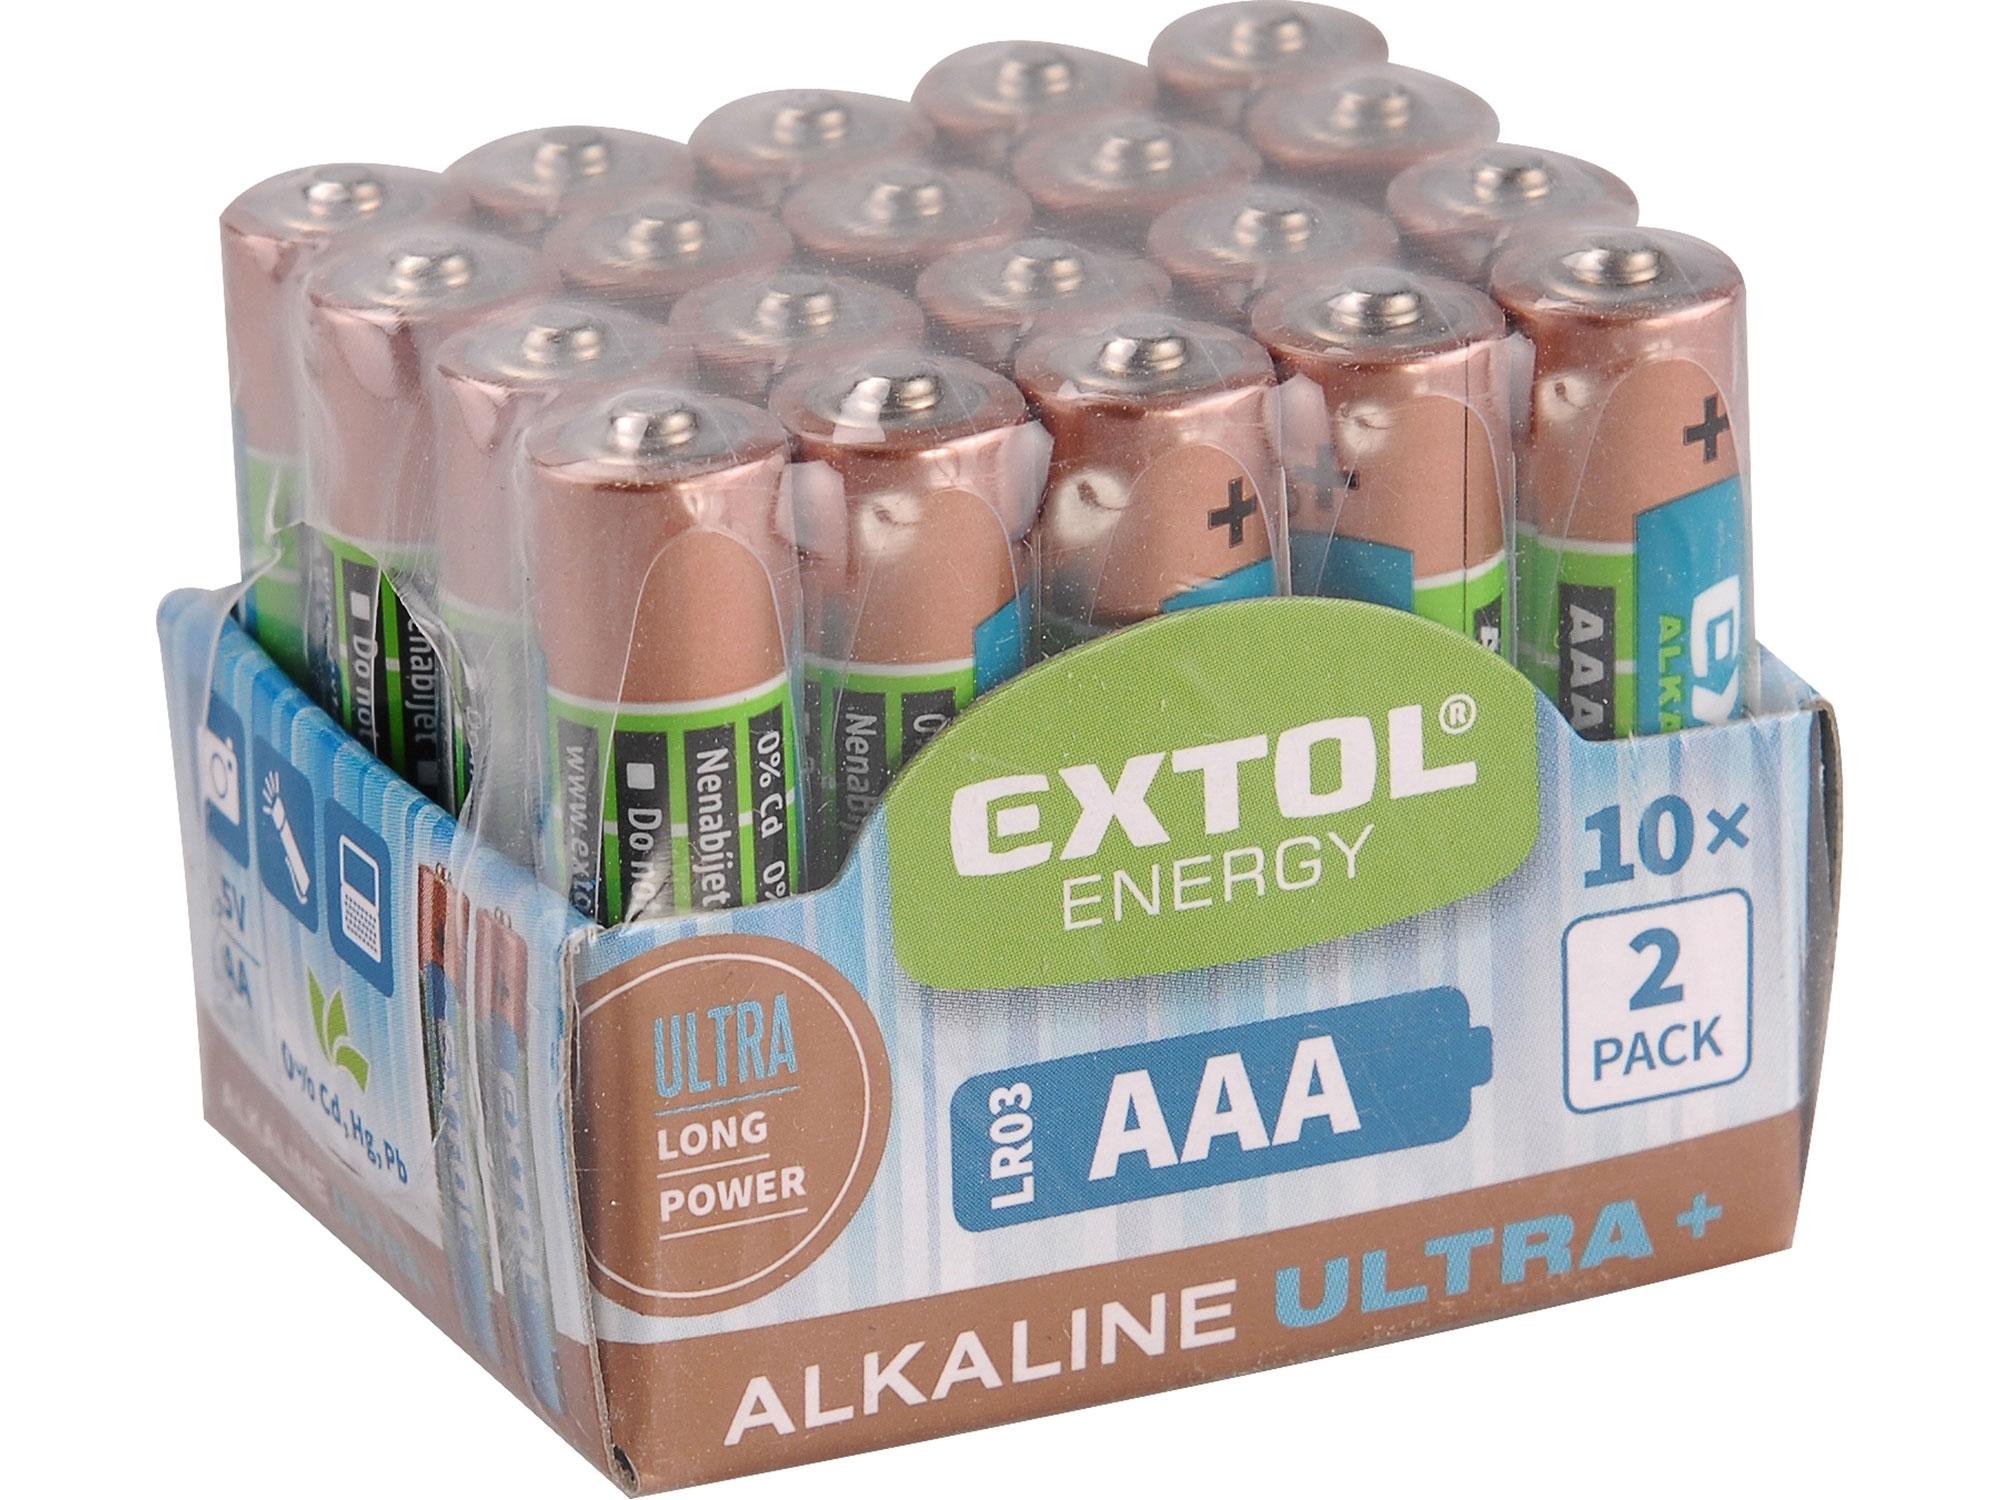 baterie alkalické, 20ks, 1,5V AA (LR6), EXTOL ENERGY 42013